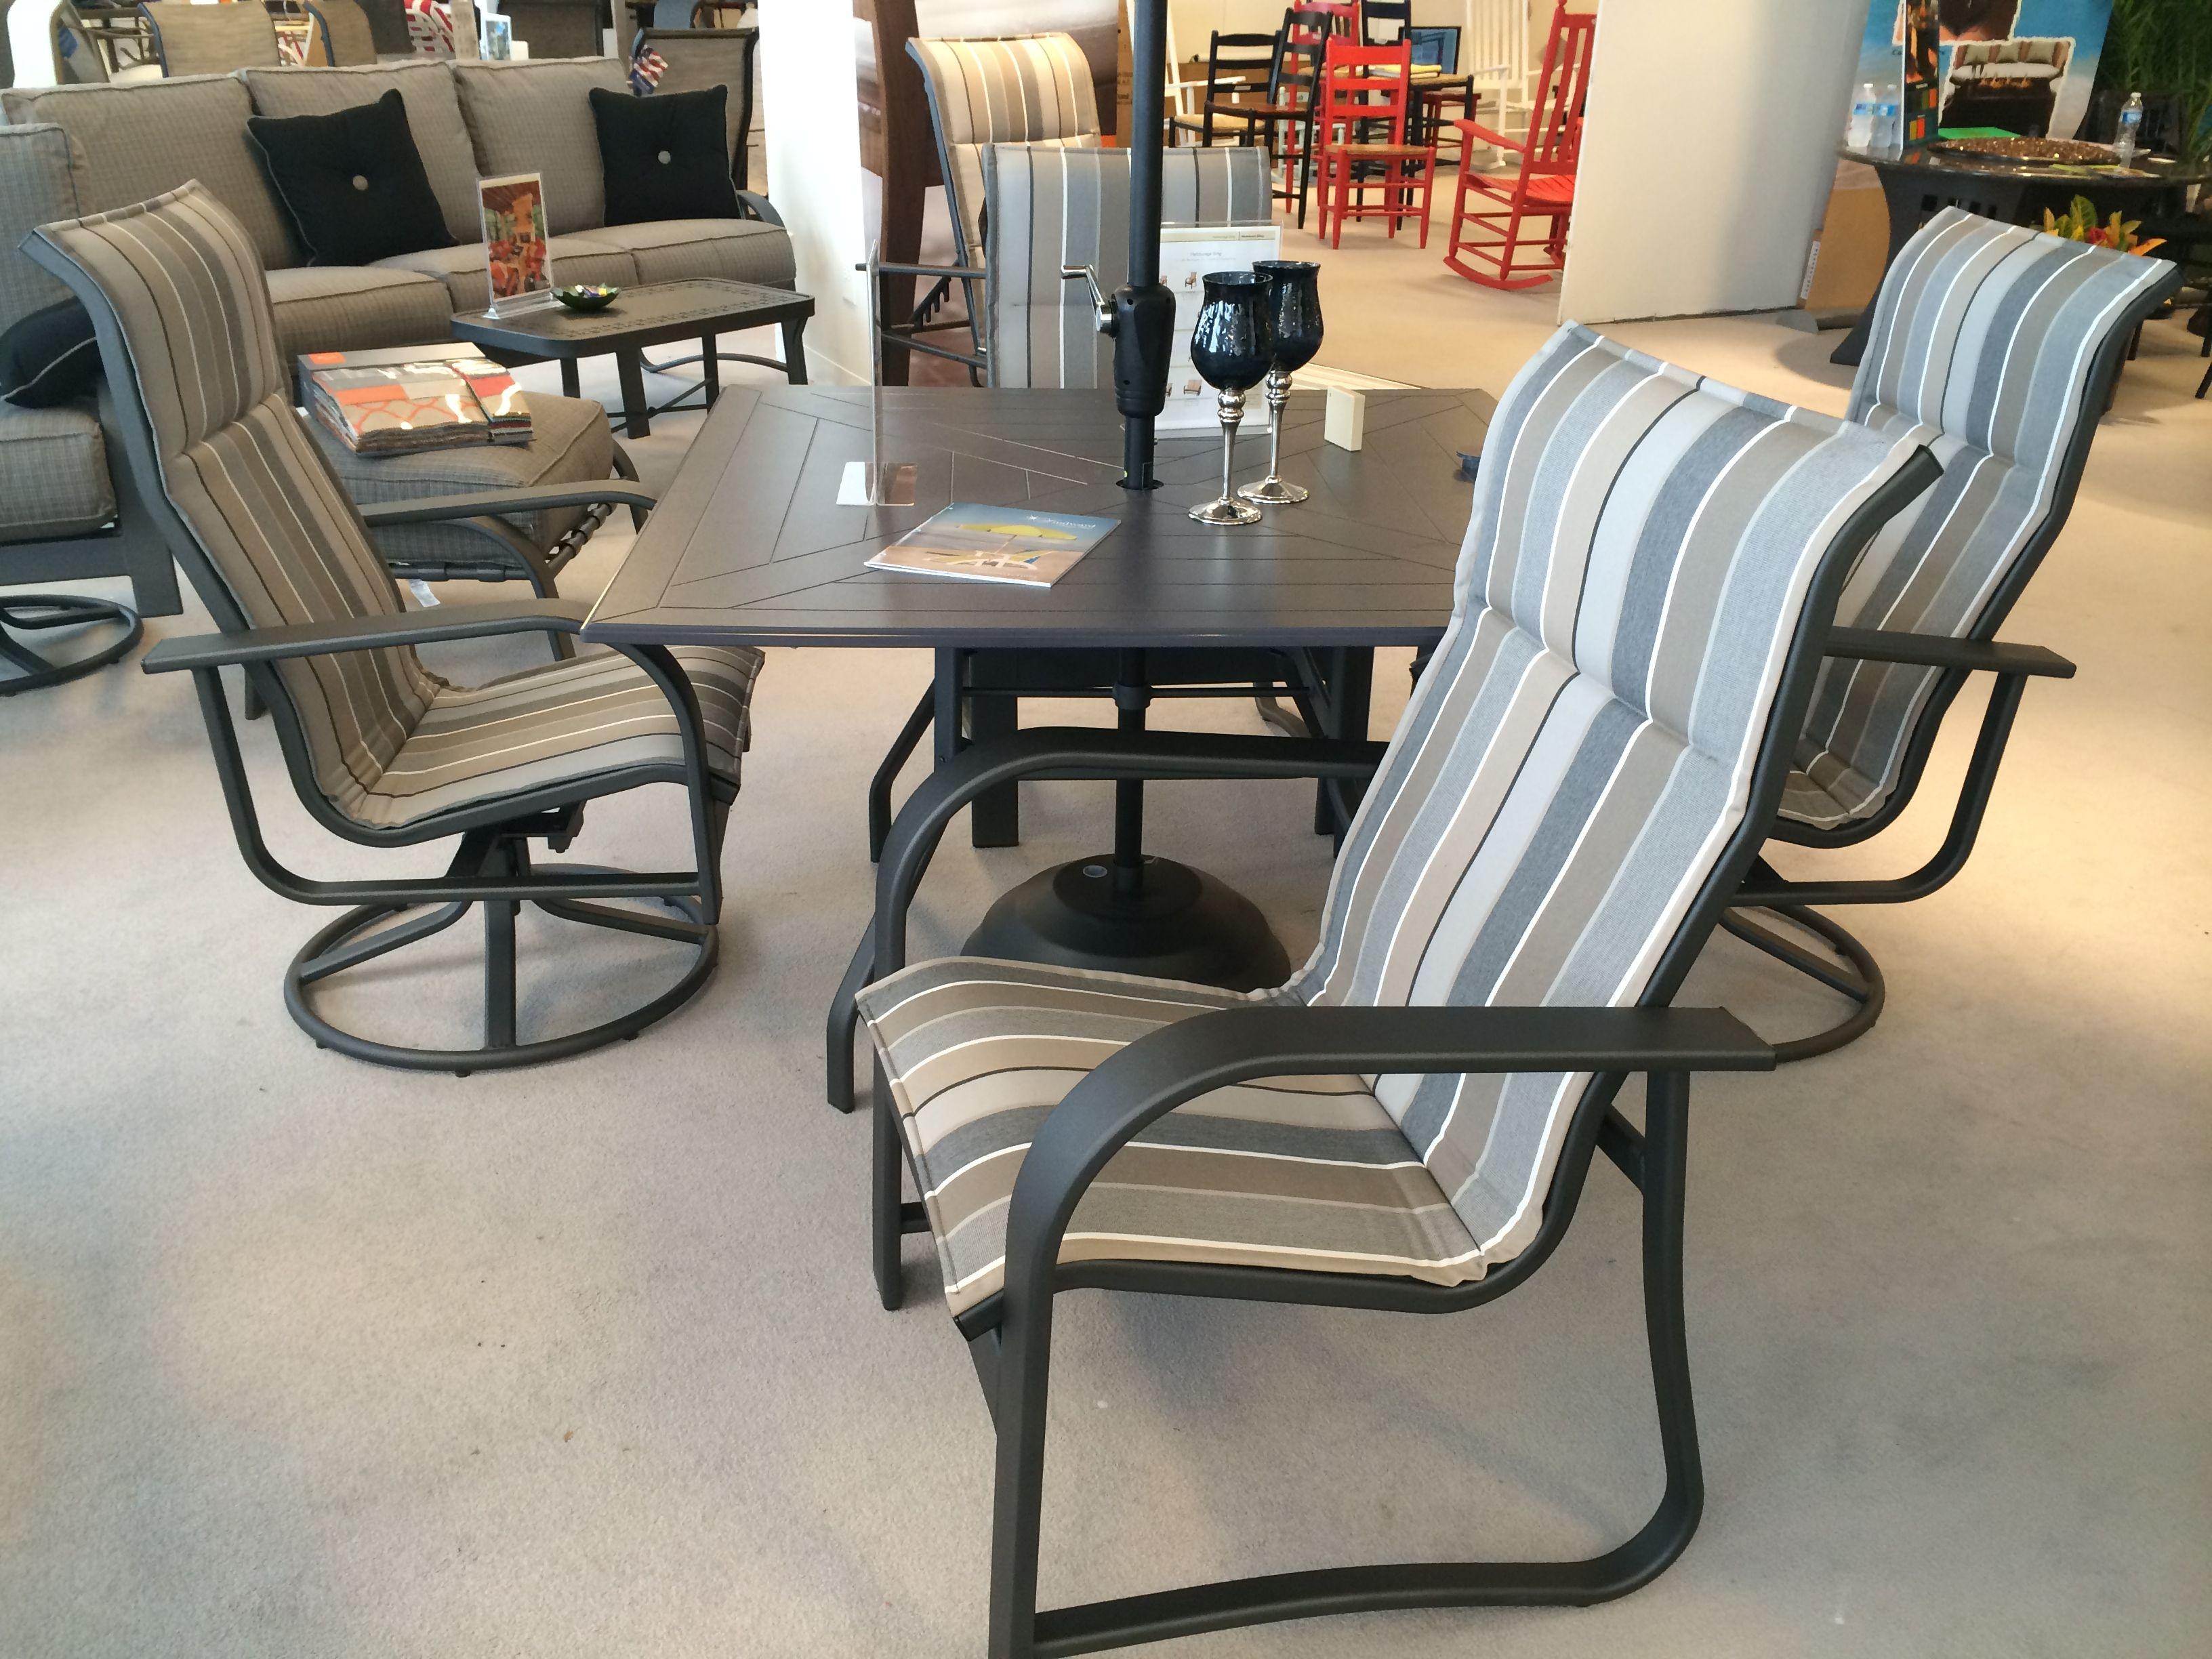 Outdoor Furniture By Windward Design